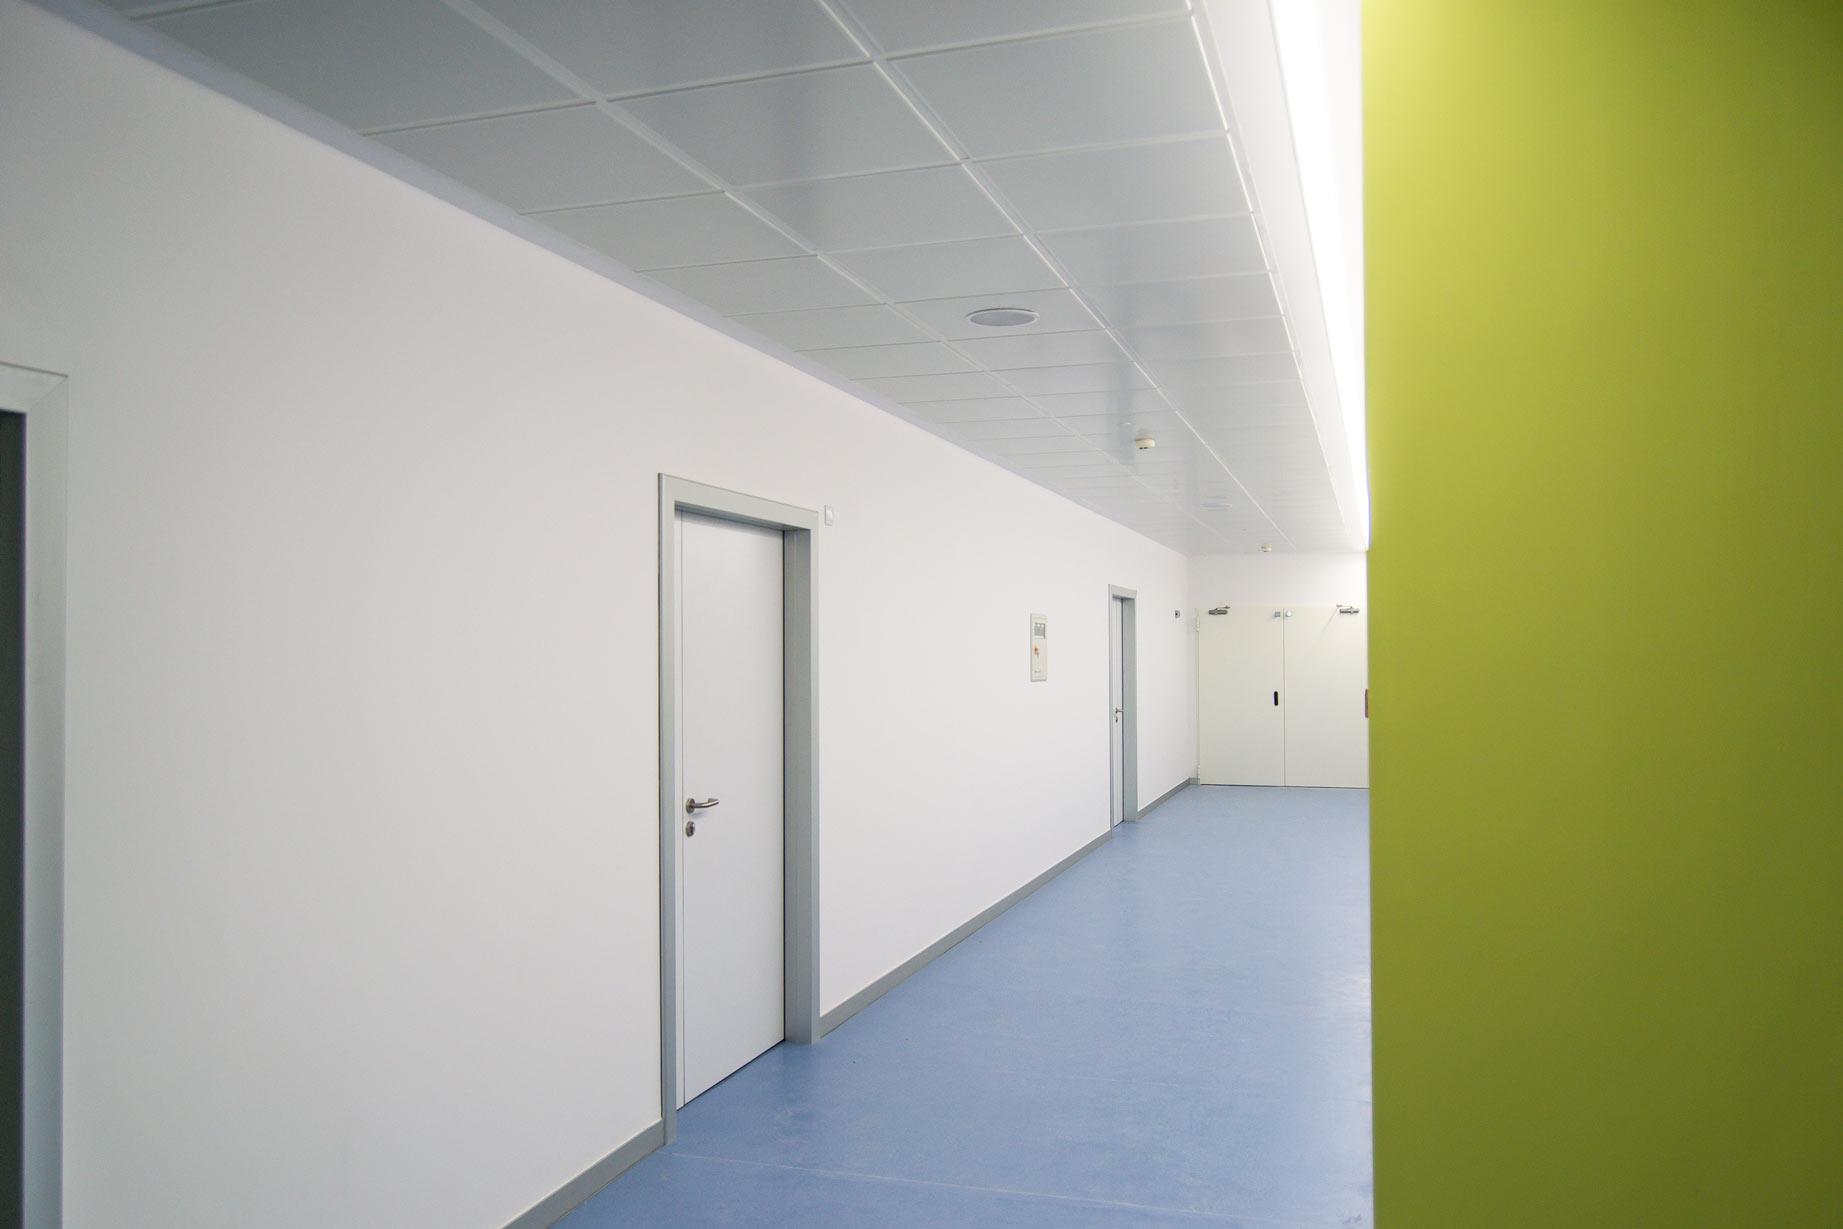 reformas viamed pasillo nuevas salas dilatacion paritorio